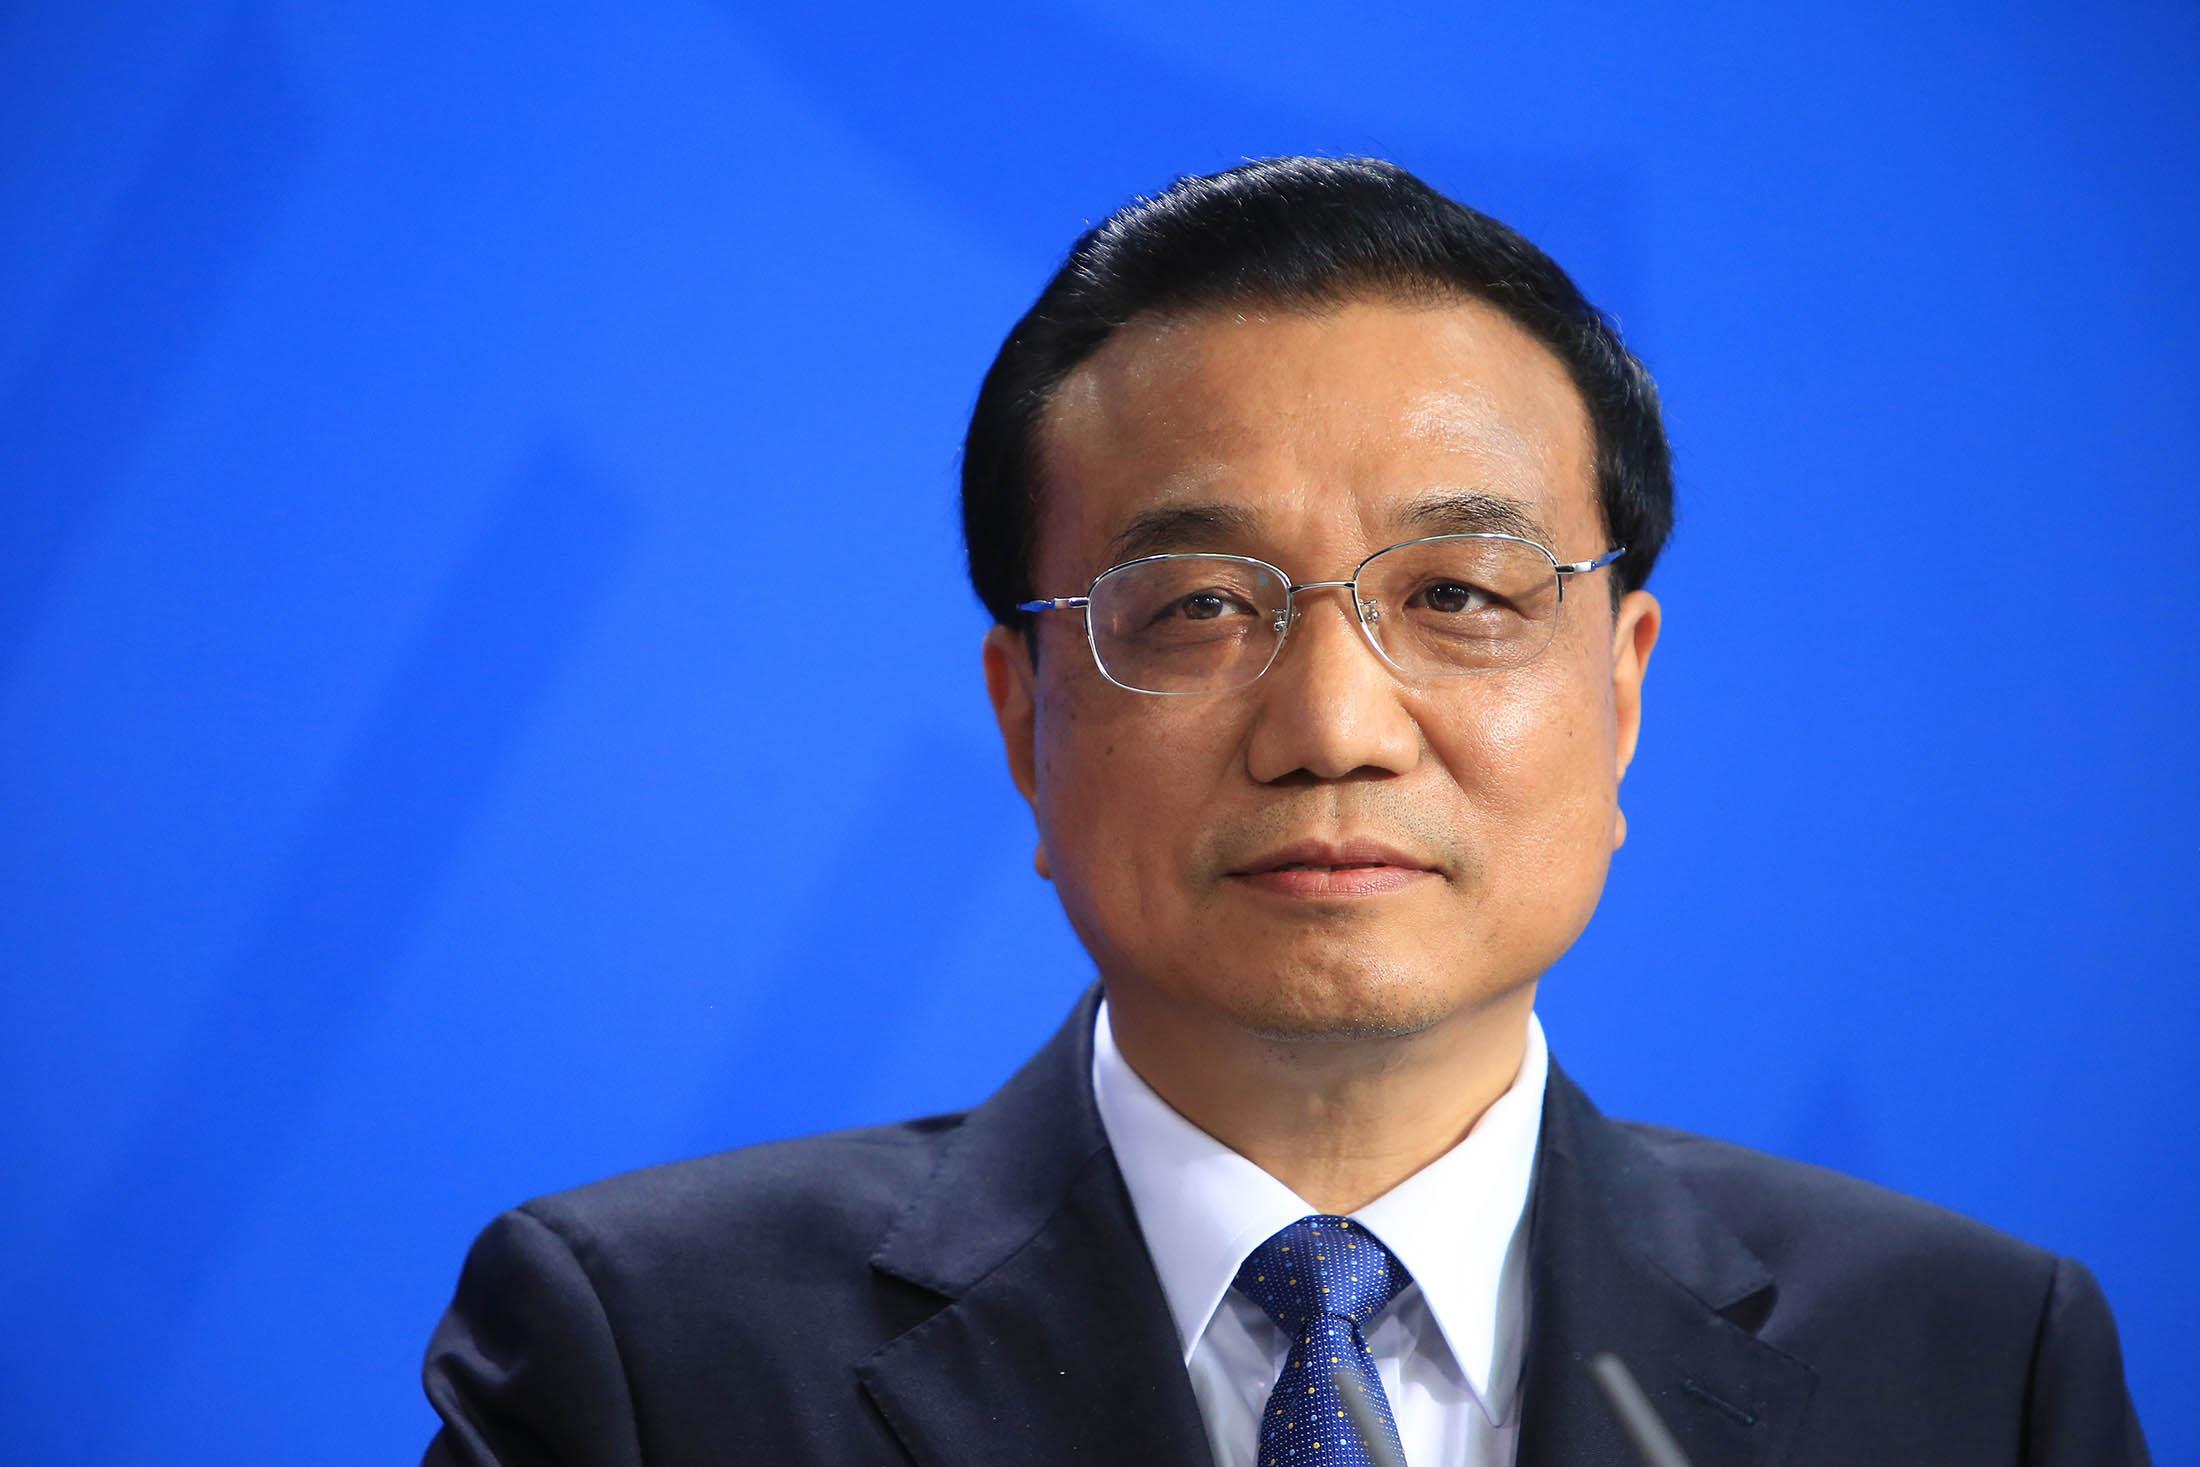 Primer ministro chino exhorta a China y Rusia a ampliar apertura para desarrollo común